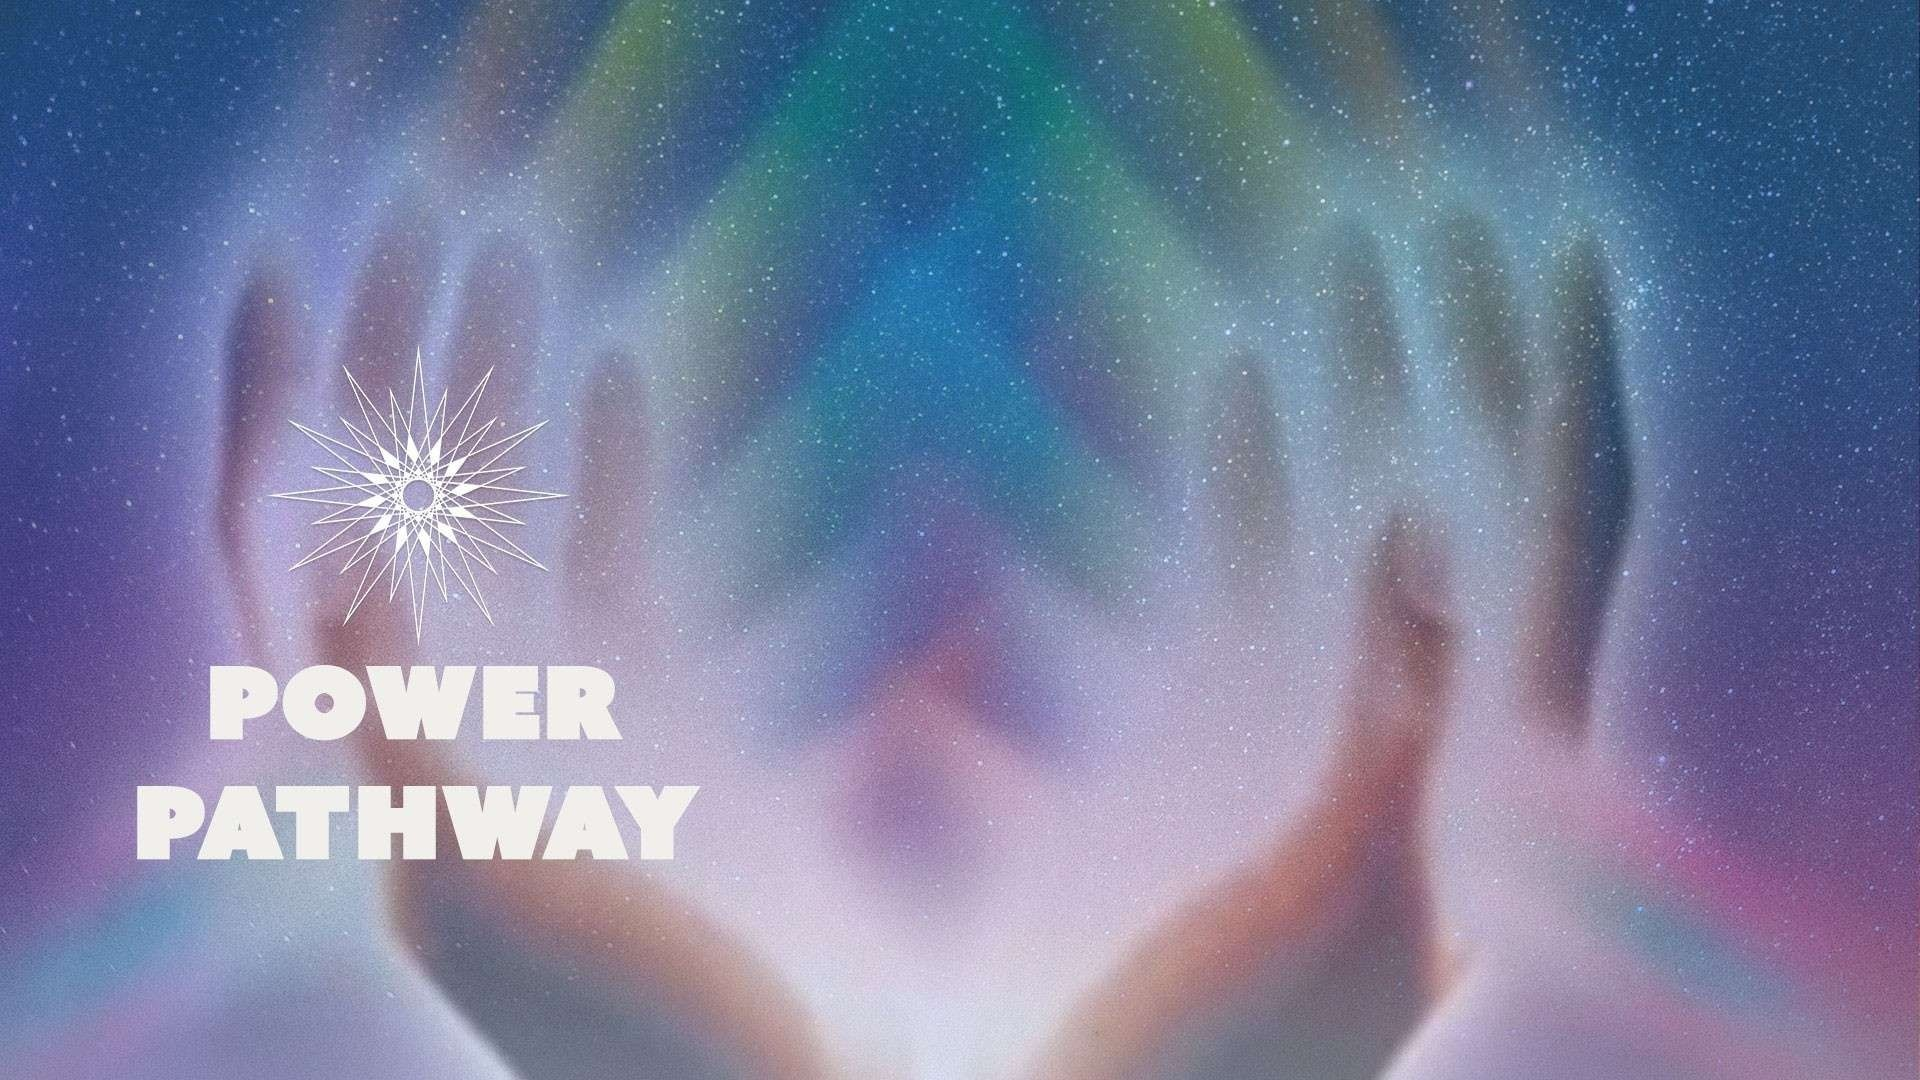 Change Your Stars - Powerpathway